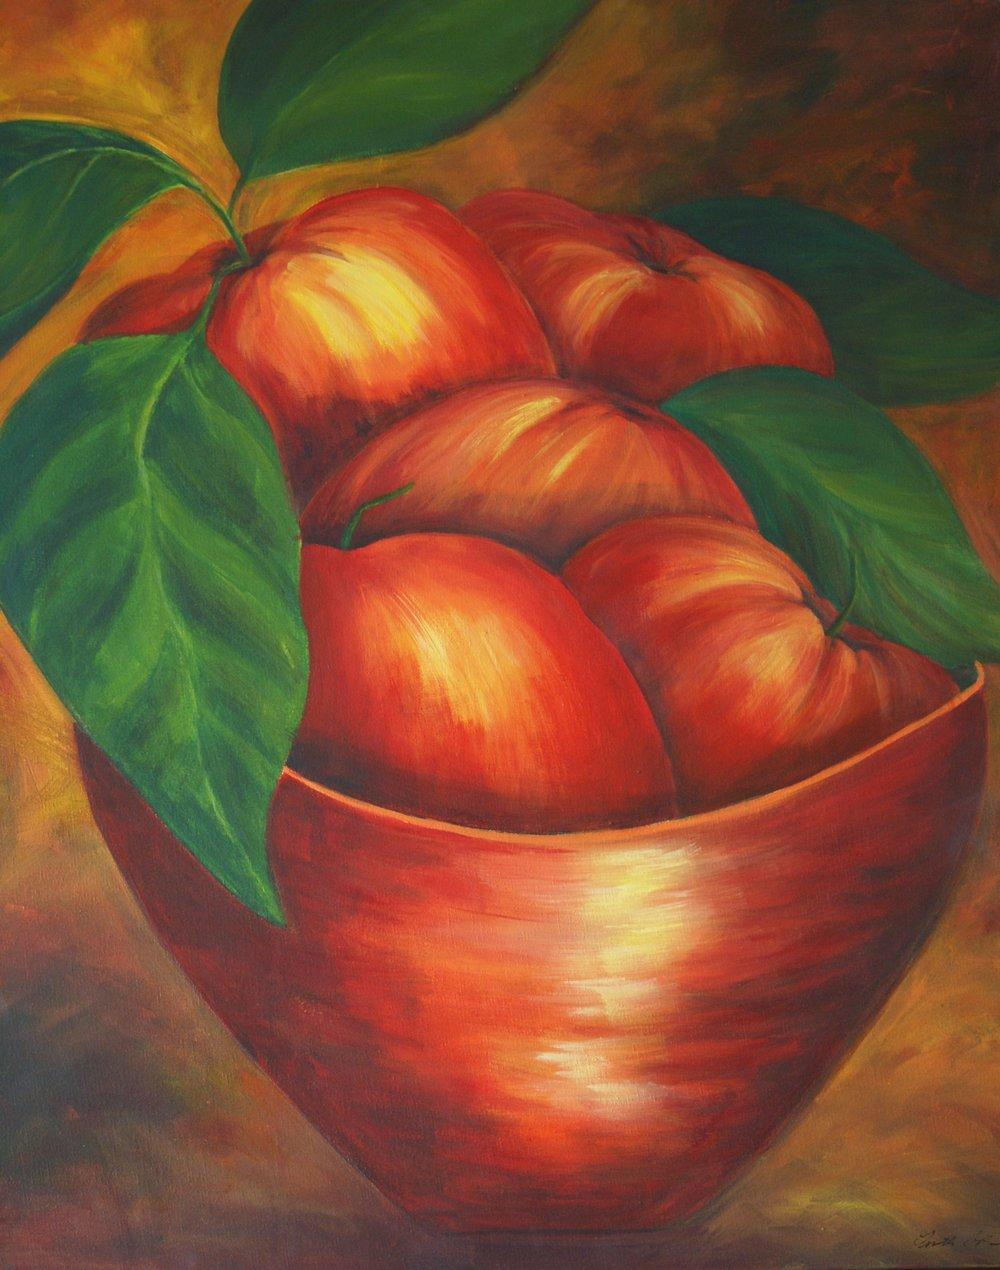 #308 Apples.JPG